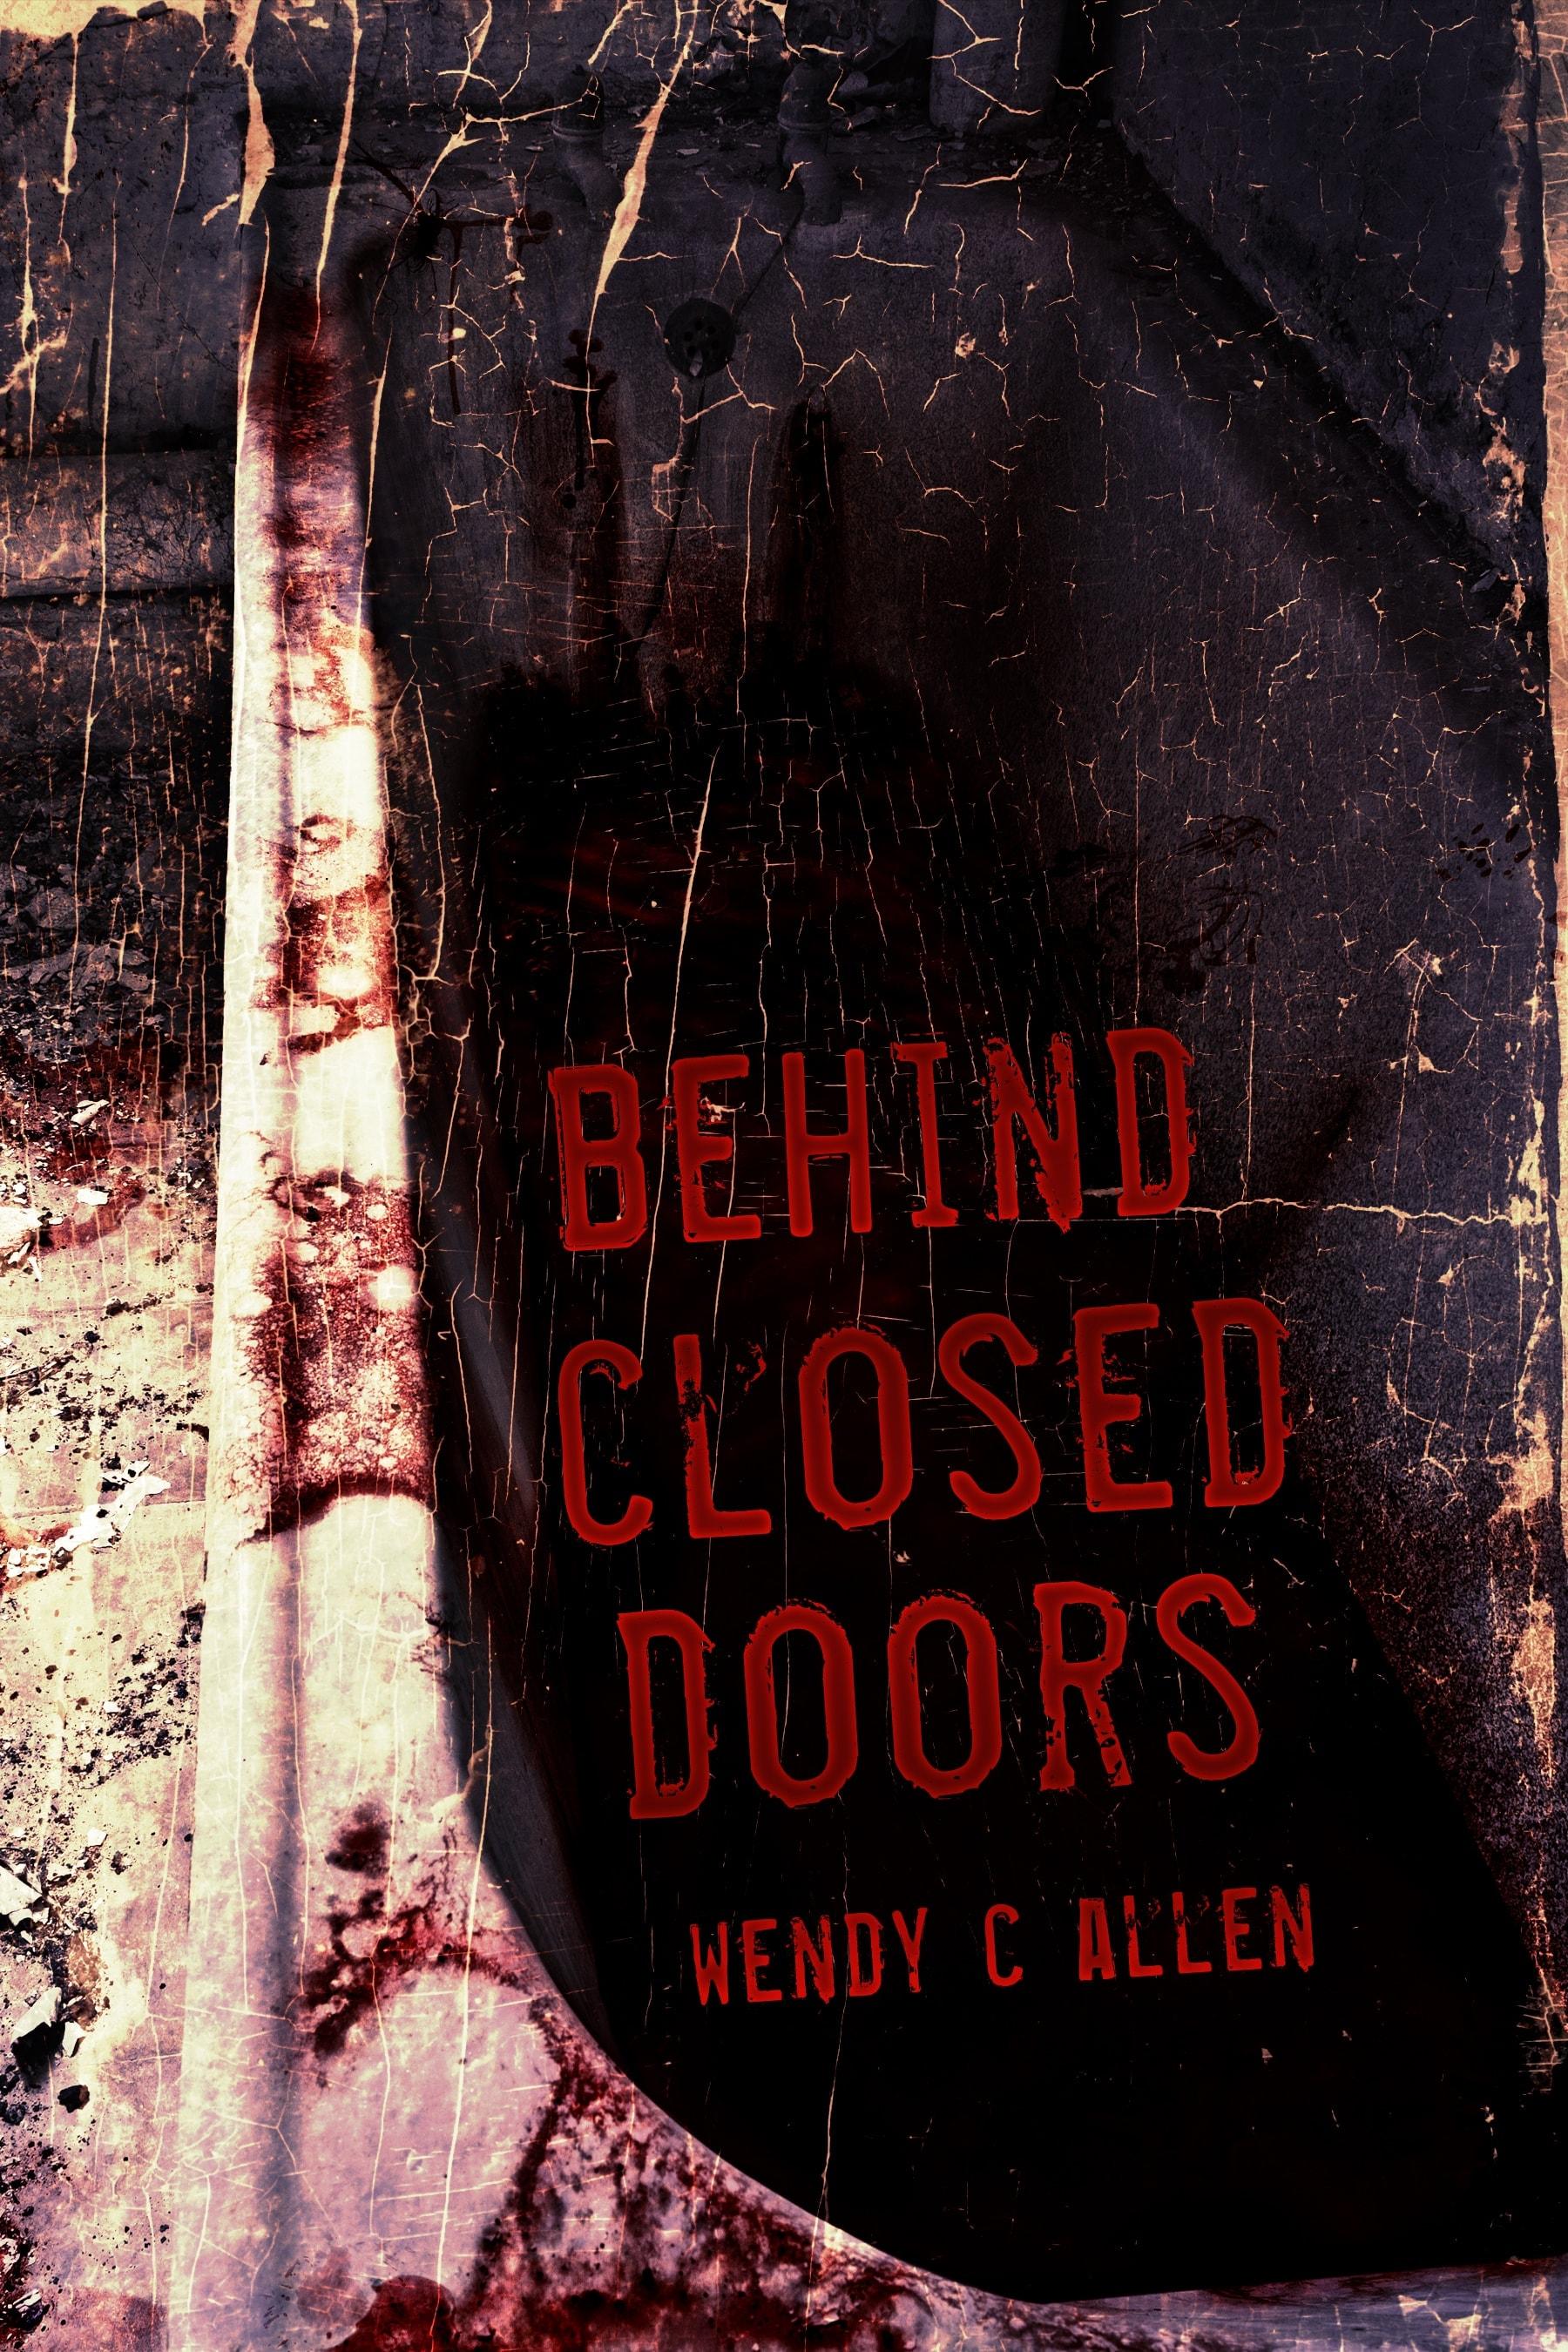 Behind Closed Doors : Portfolio rocking book covers